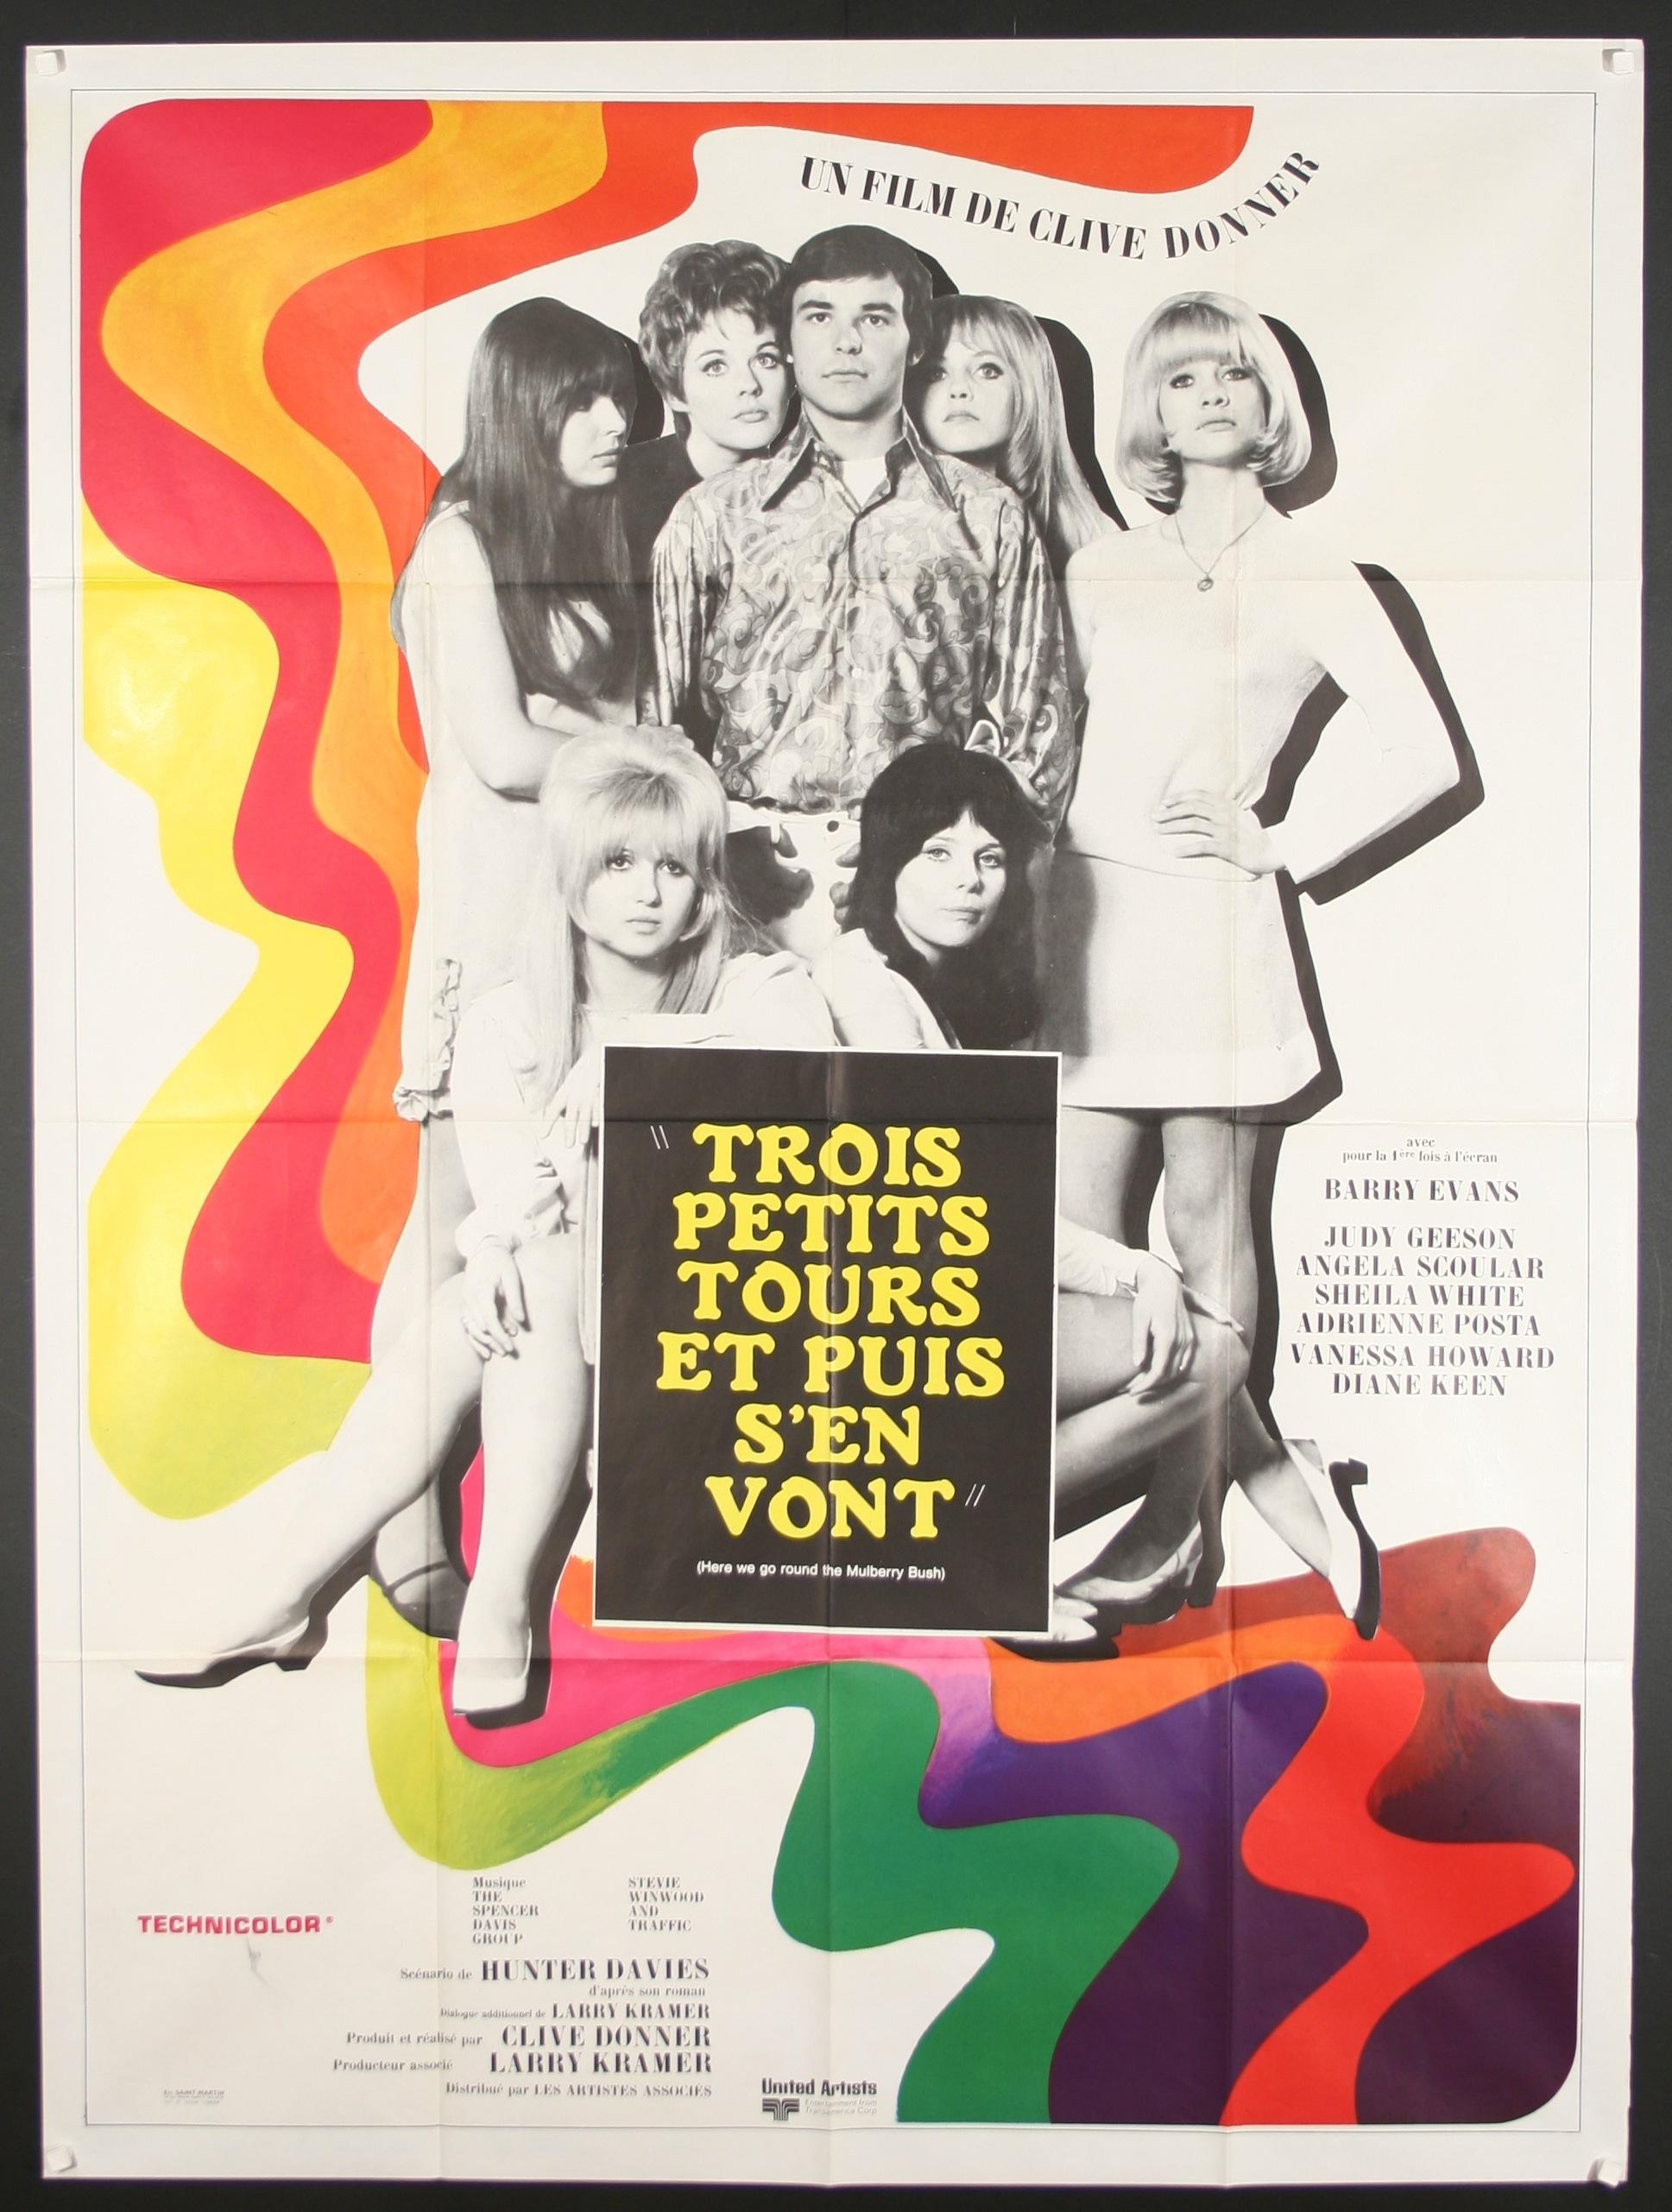 Una Pagina De Cine 1968 Here We Go Round The Mulberry Bush